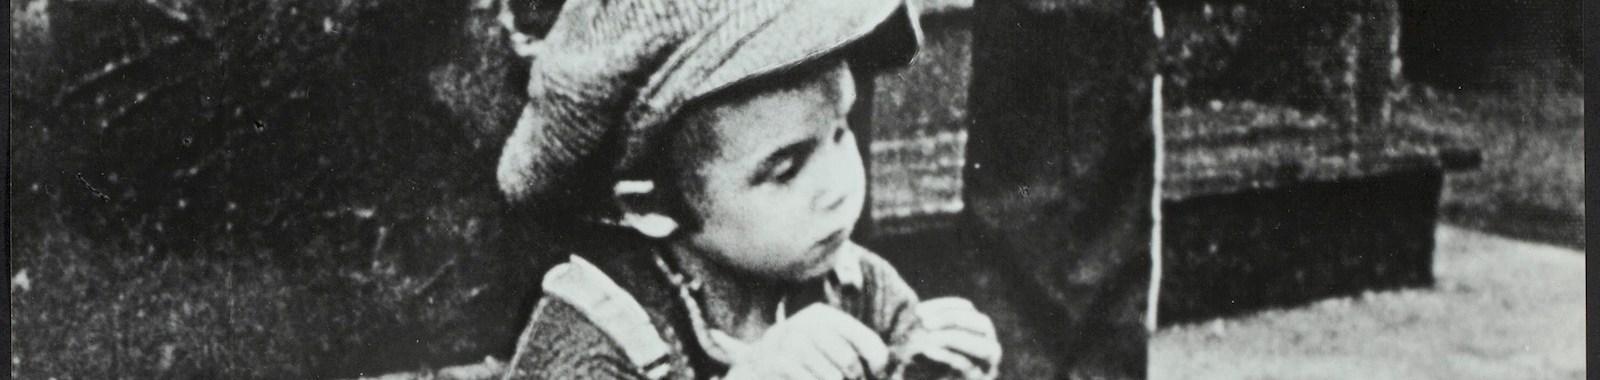 Still_from_Charles_Chaplin_-_The_Kid_-_1921_-_Charles_Chaplin_Productions_-_EYE_FOT2424_eye